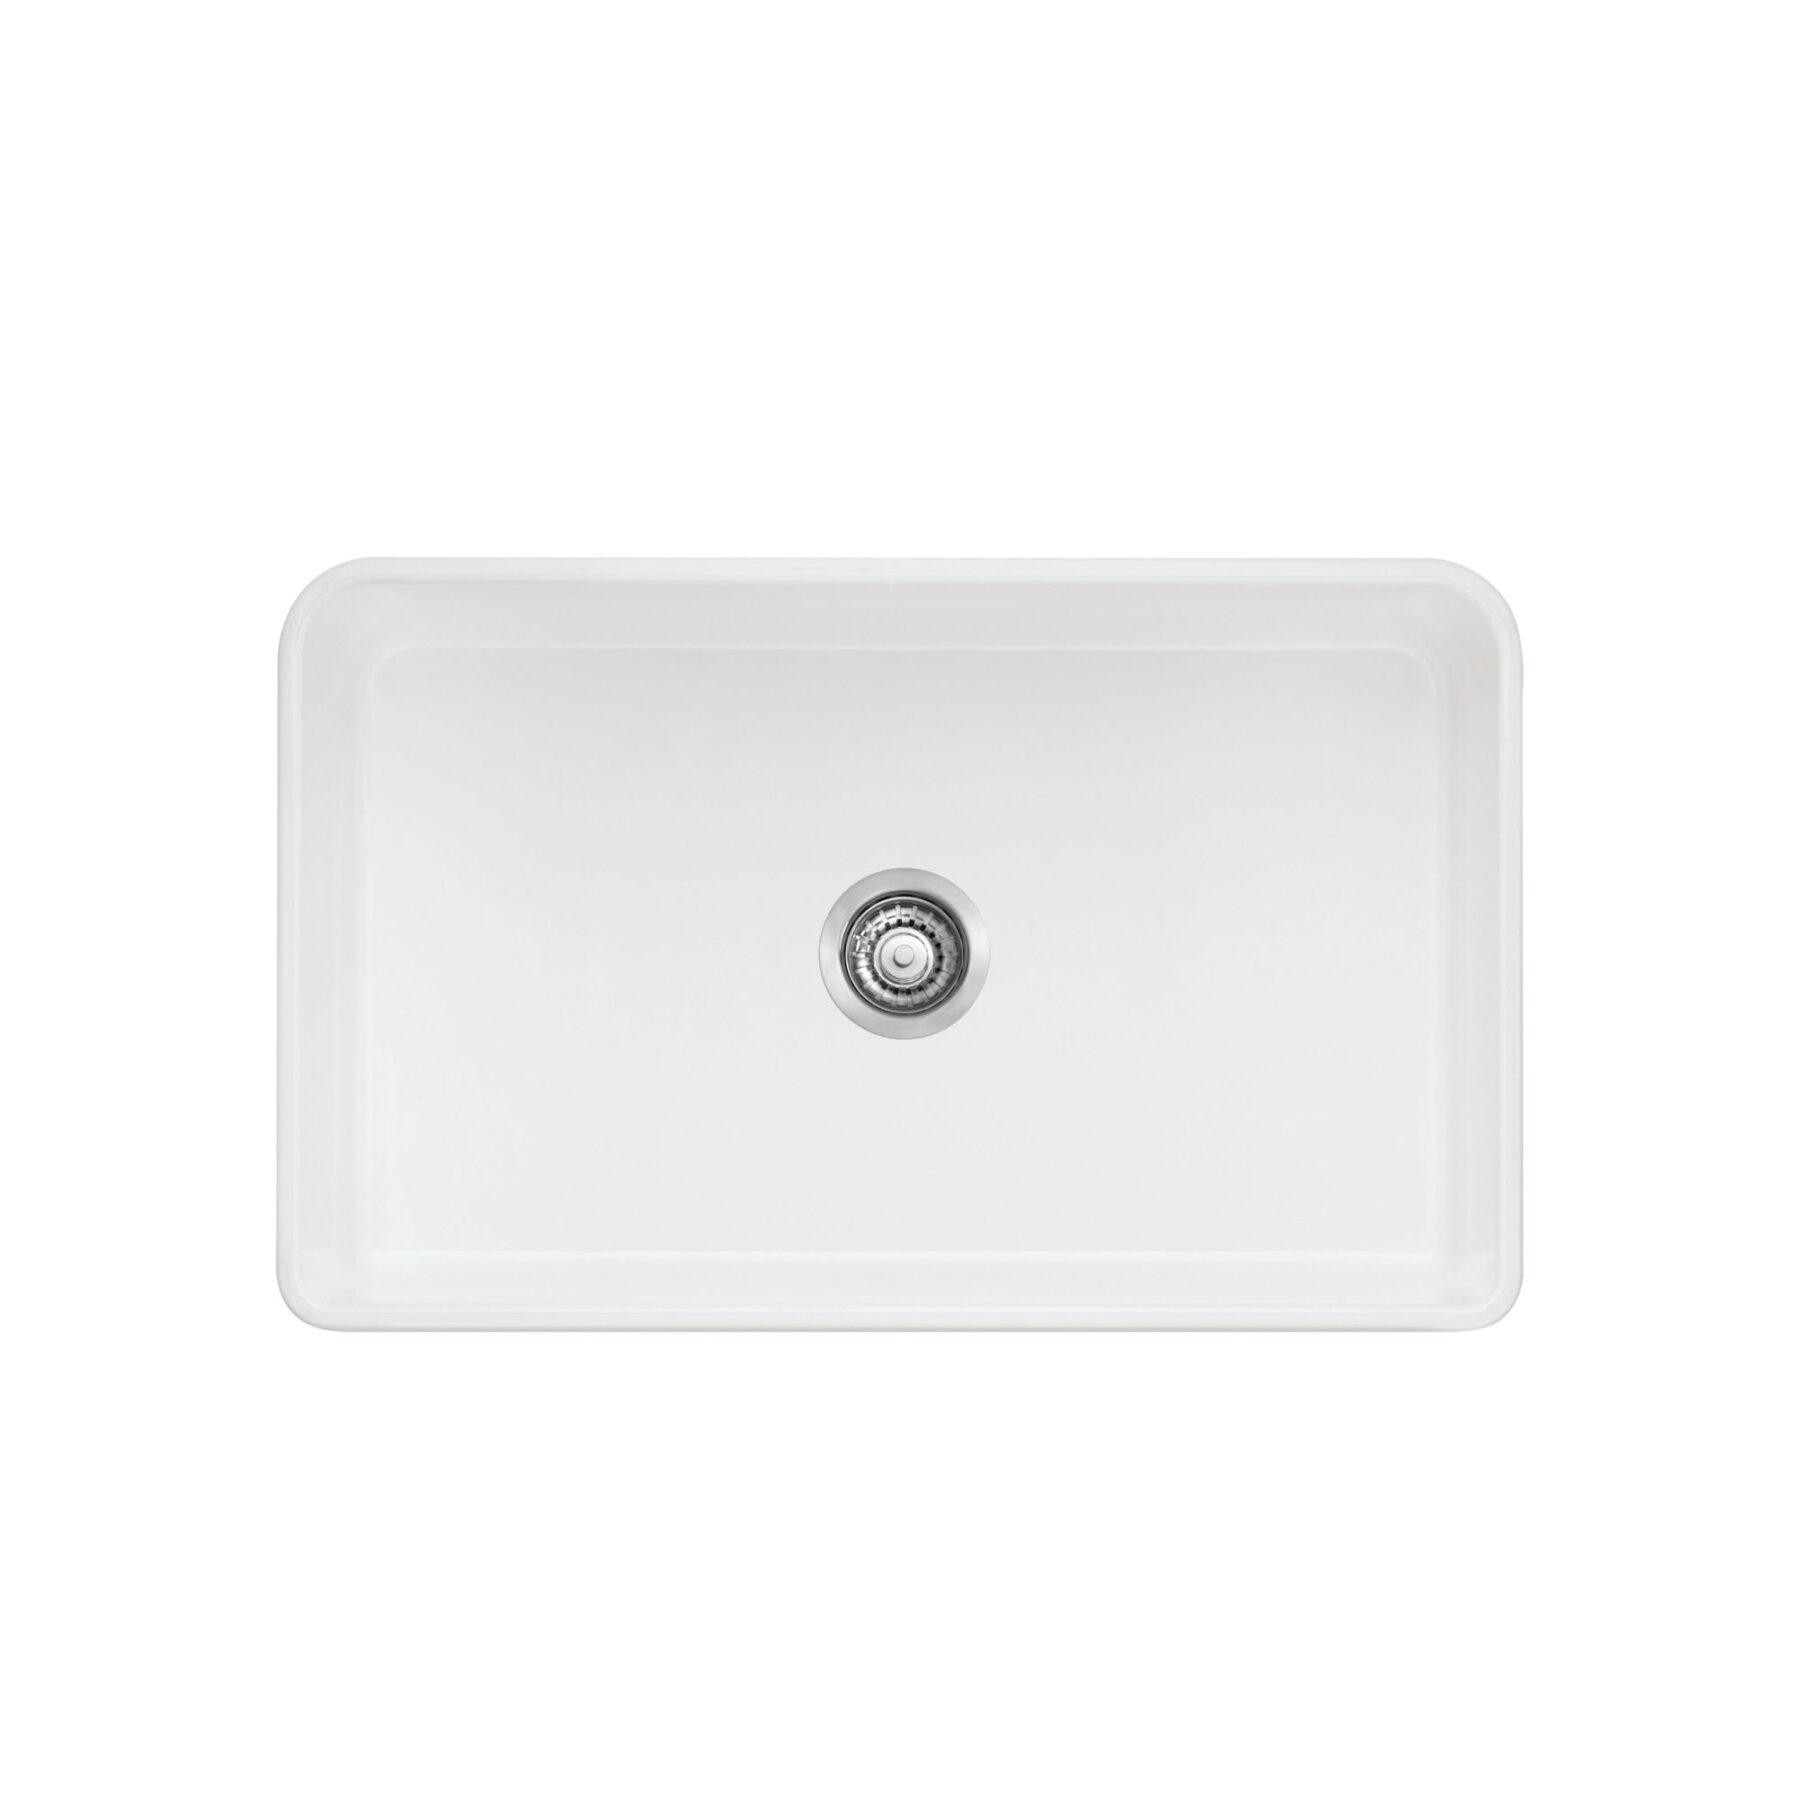 blanco 401428 cerana ceramic fireclay farmhouse kitchen sink